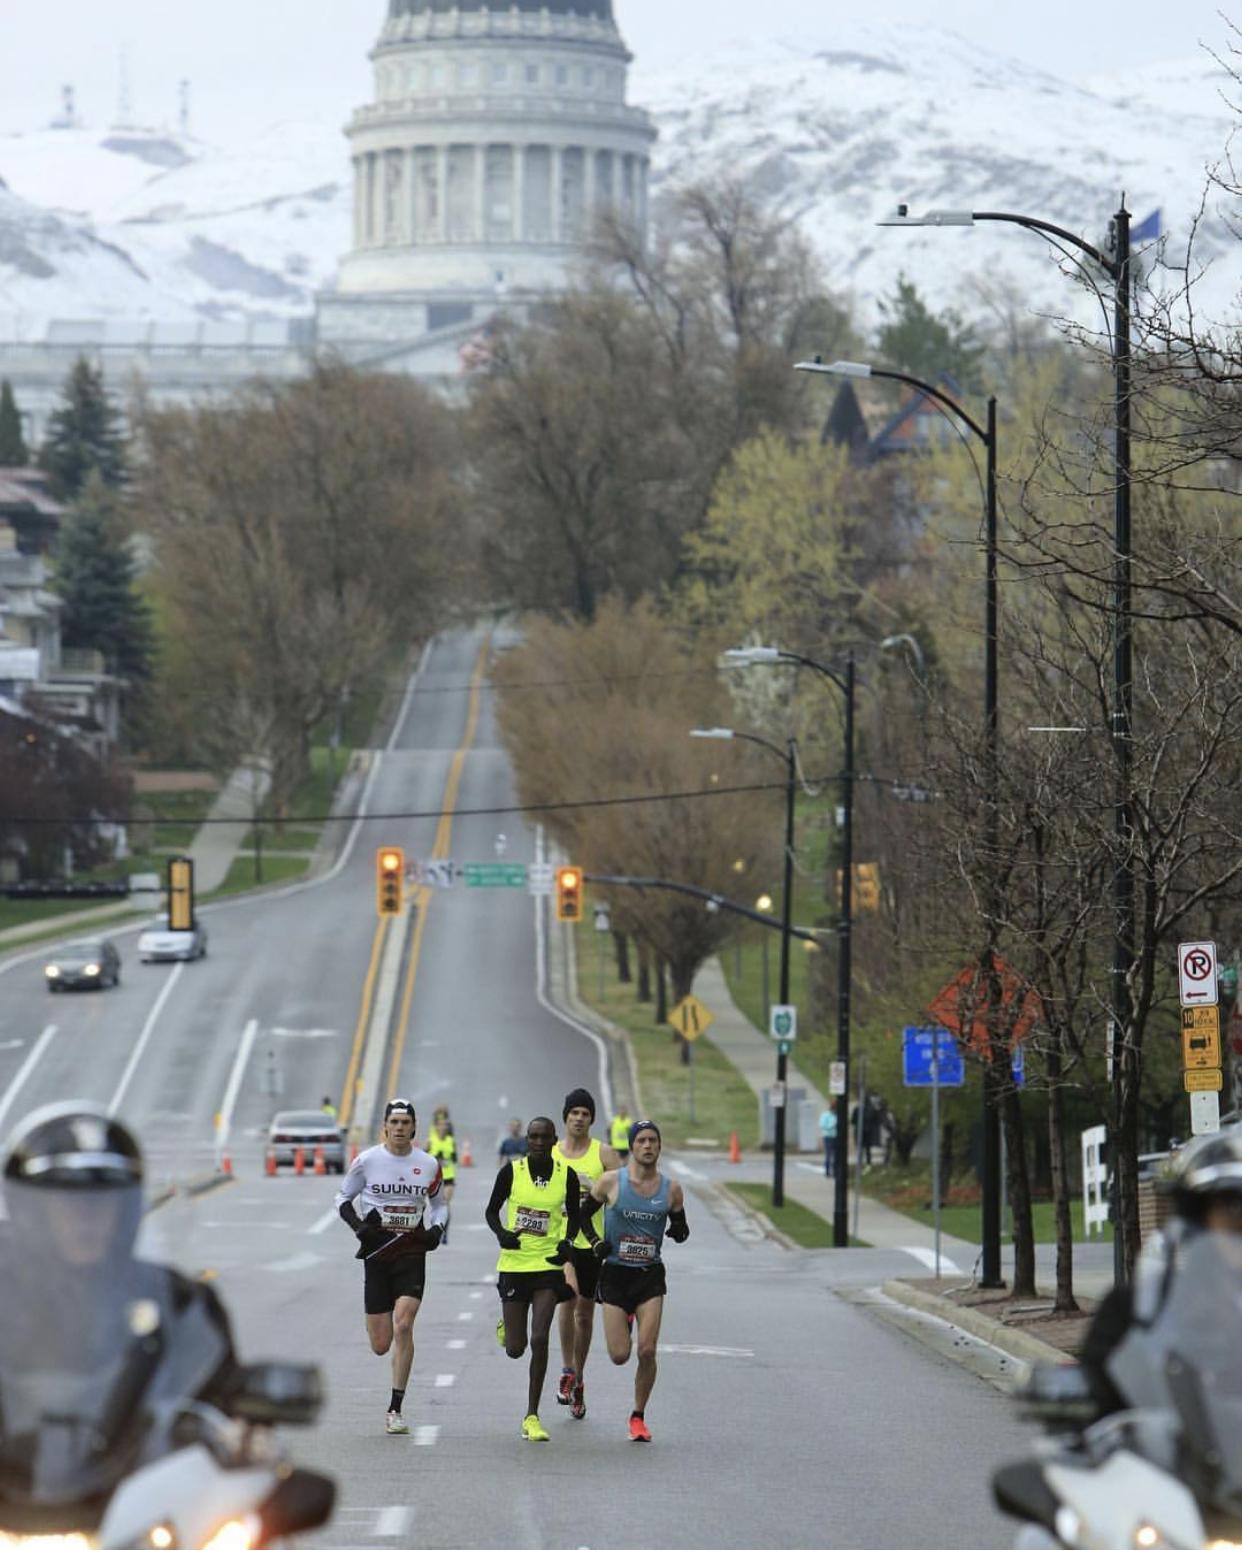 Adam Olson on his way to a 6th place finish (1:09:53 half marathon)